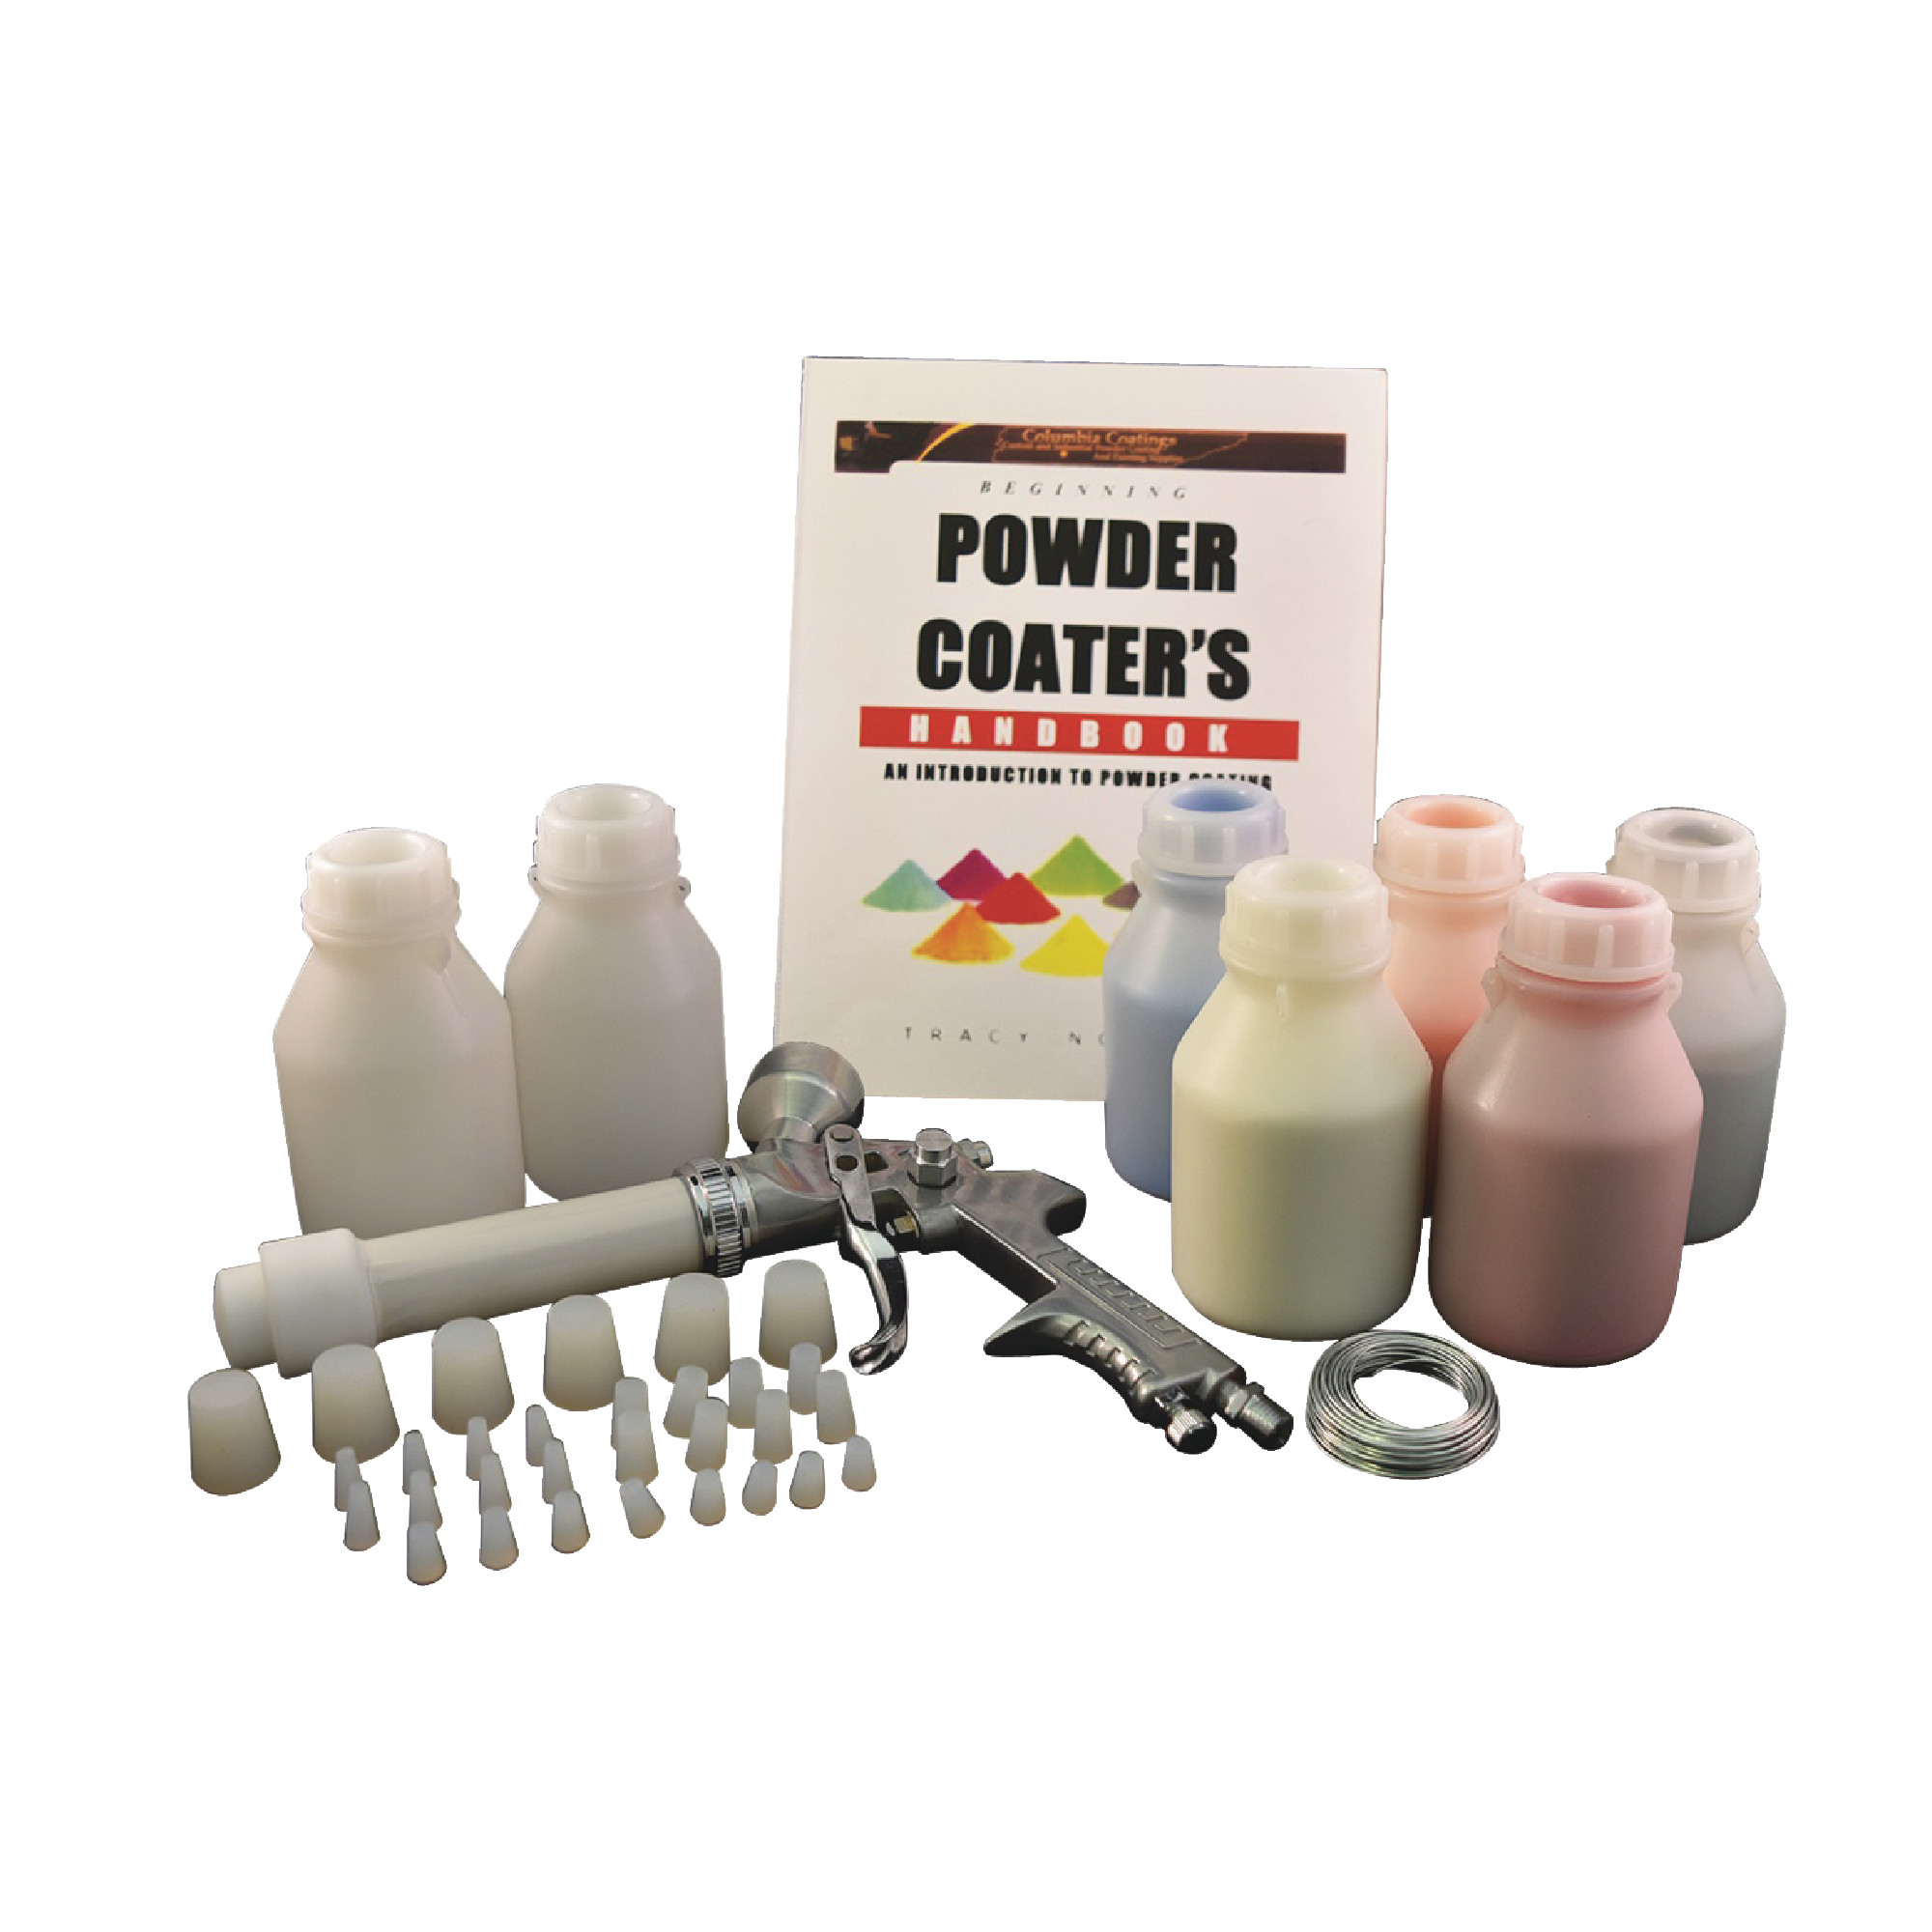 Powder Coating Kit